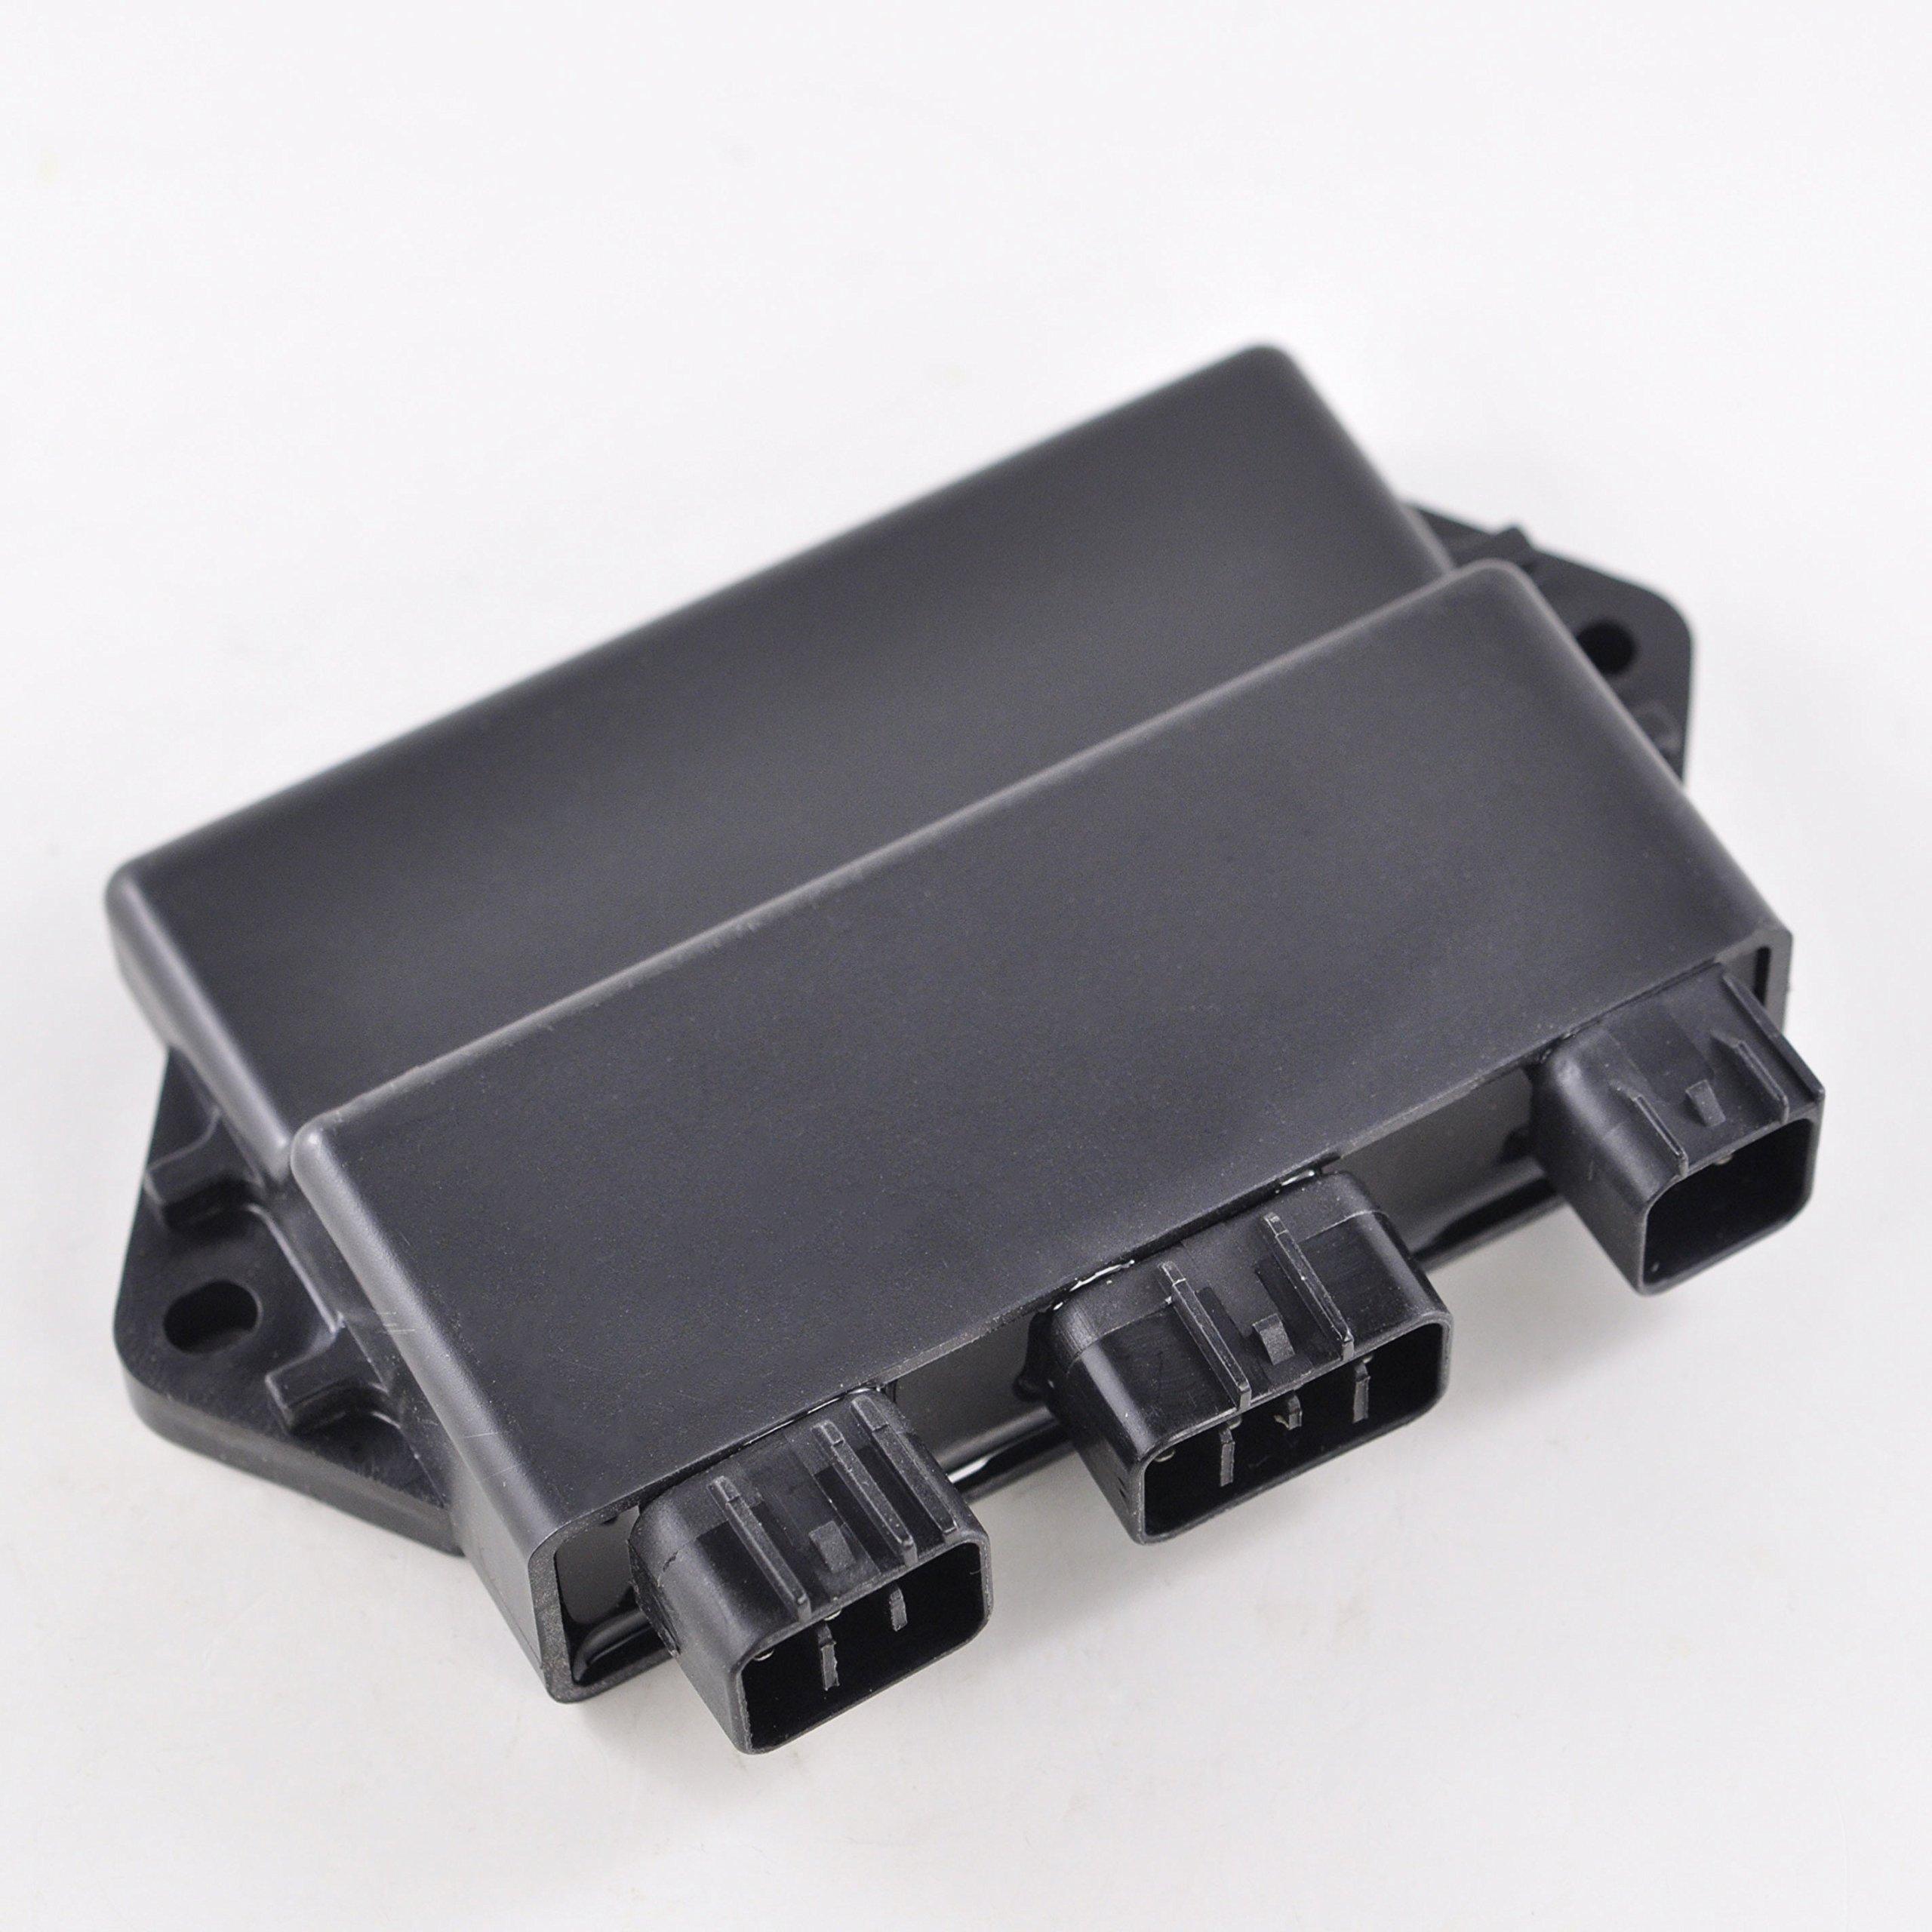 High Performance CDI Box For Yamaha YFM 660 Raptor 2001 OEM Repl. # 5LP-85540-00-00 5LP-85540-10-00 Black Box YFM660R 660R